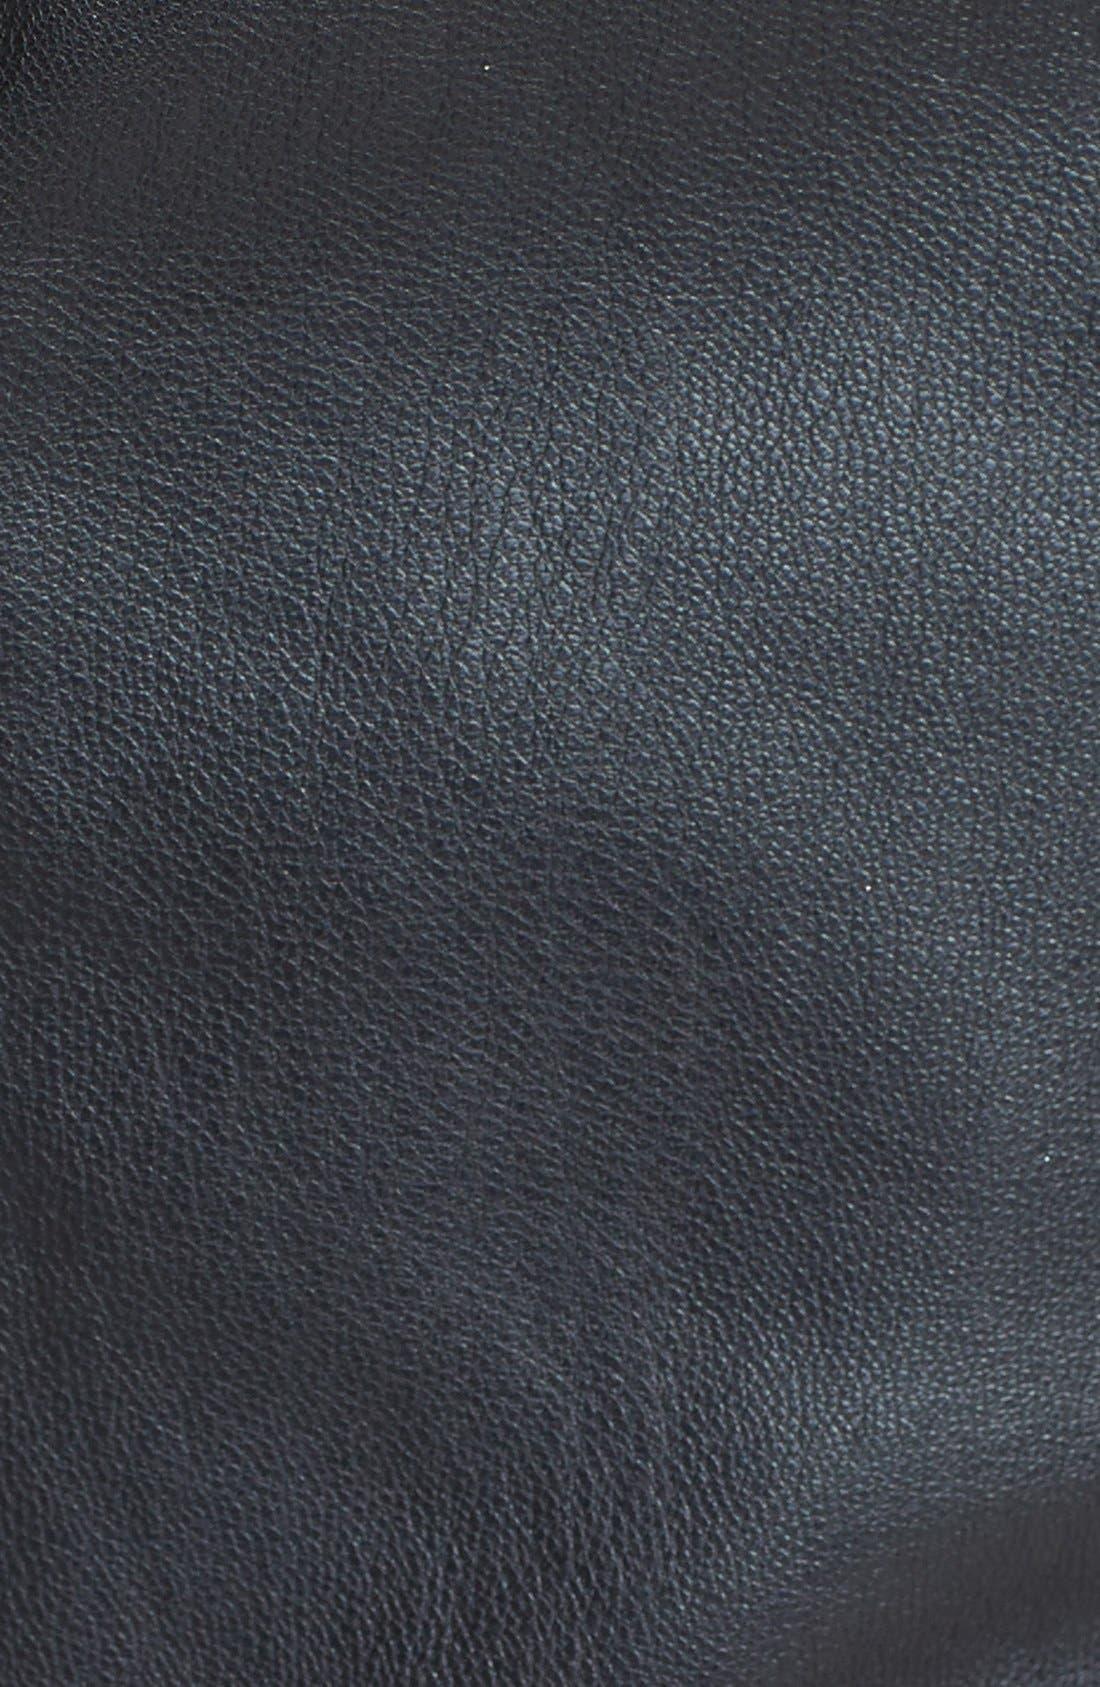 Alternate Image 3  - ASTR Faux Leather Halter Crop Top